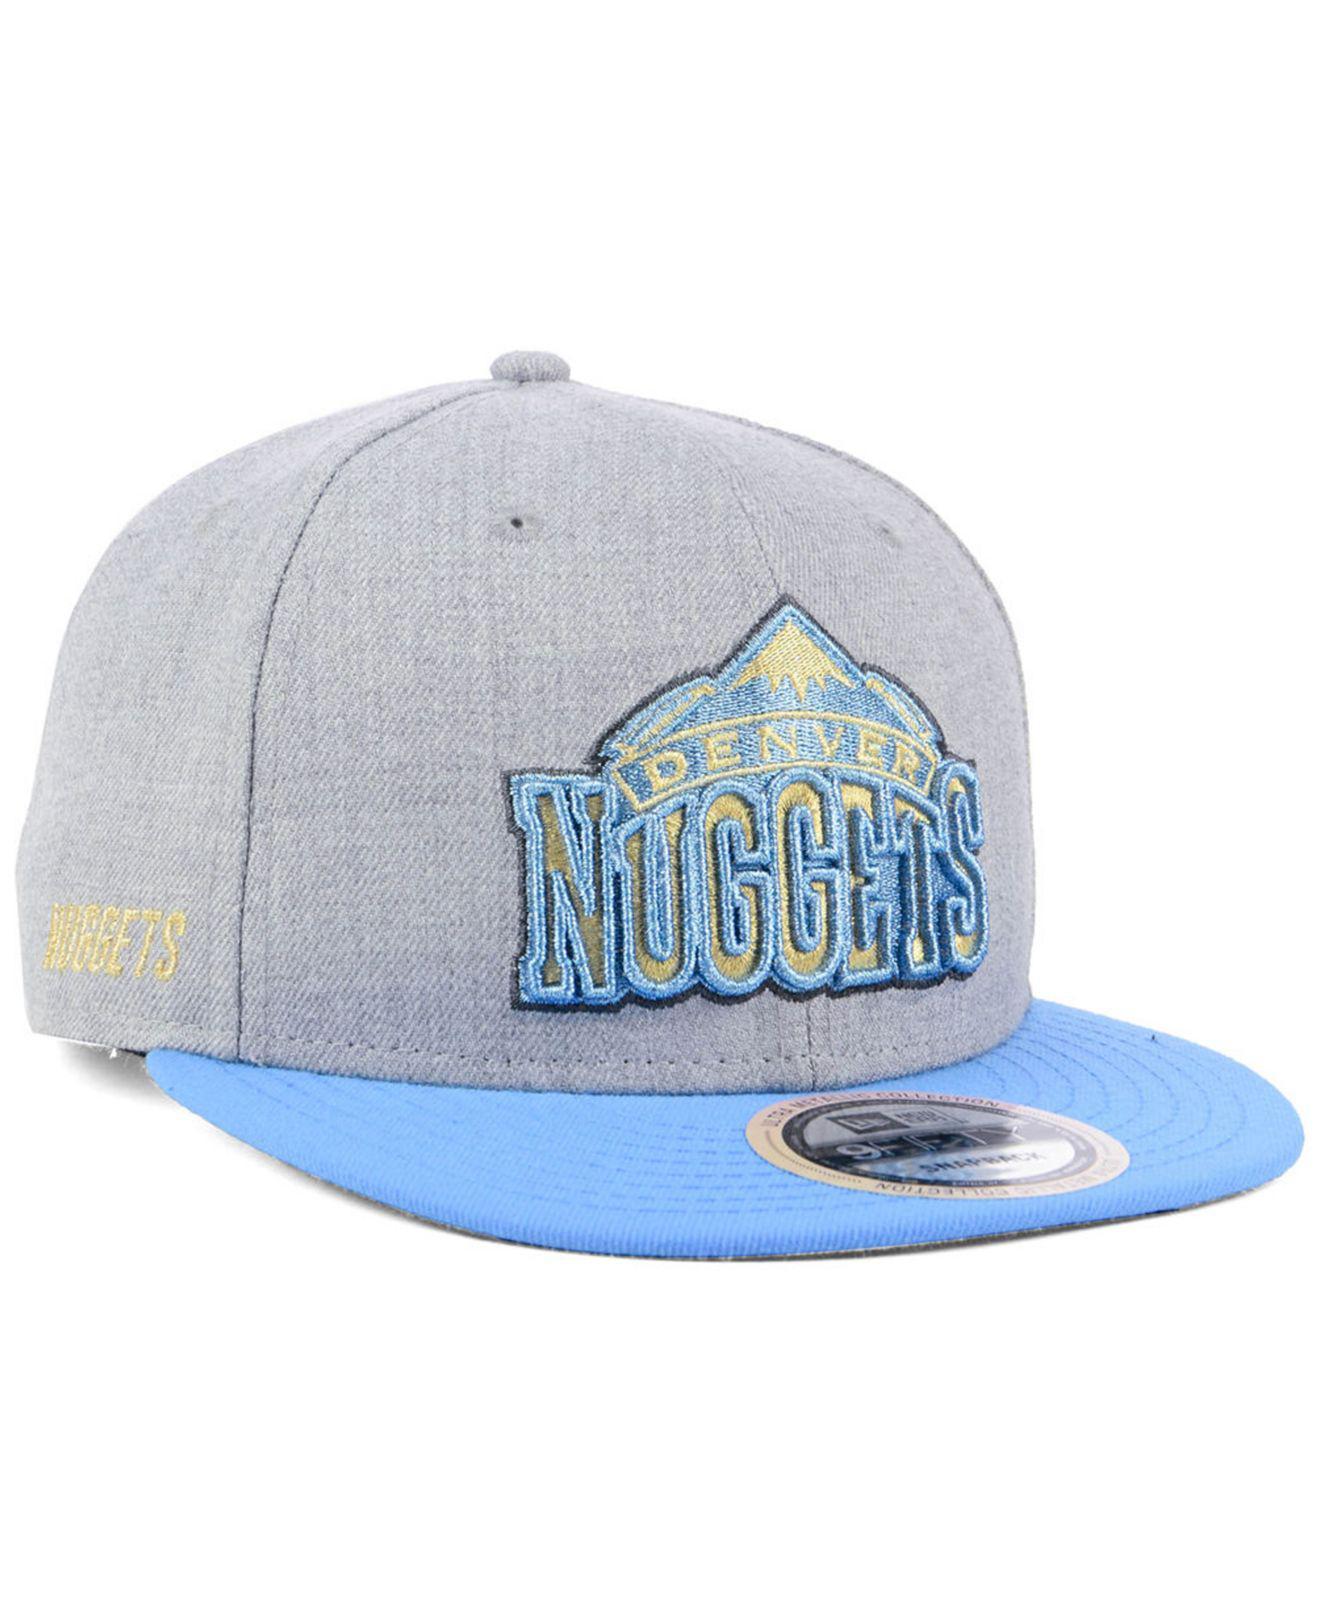 release date: 1cf6f ec1f4 Lyst - Ktz Denver Nuggets Heather Metallic 9fifty Snapback Cap in ...